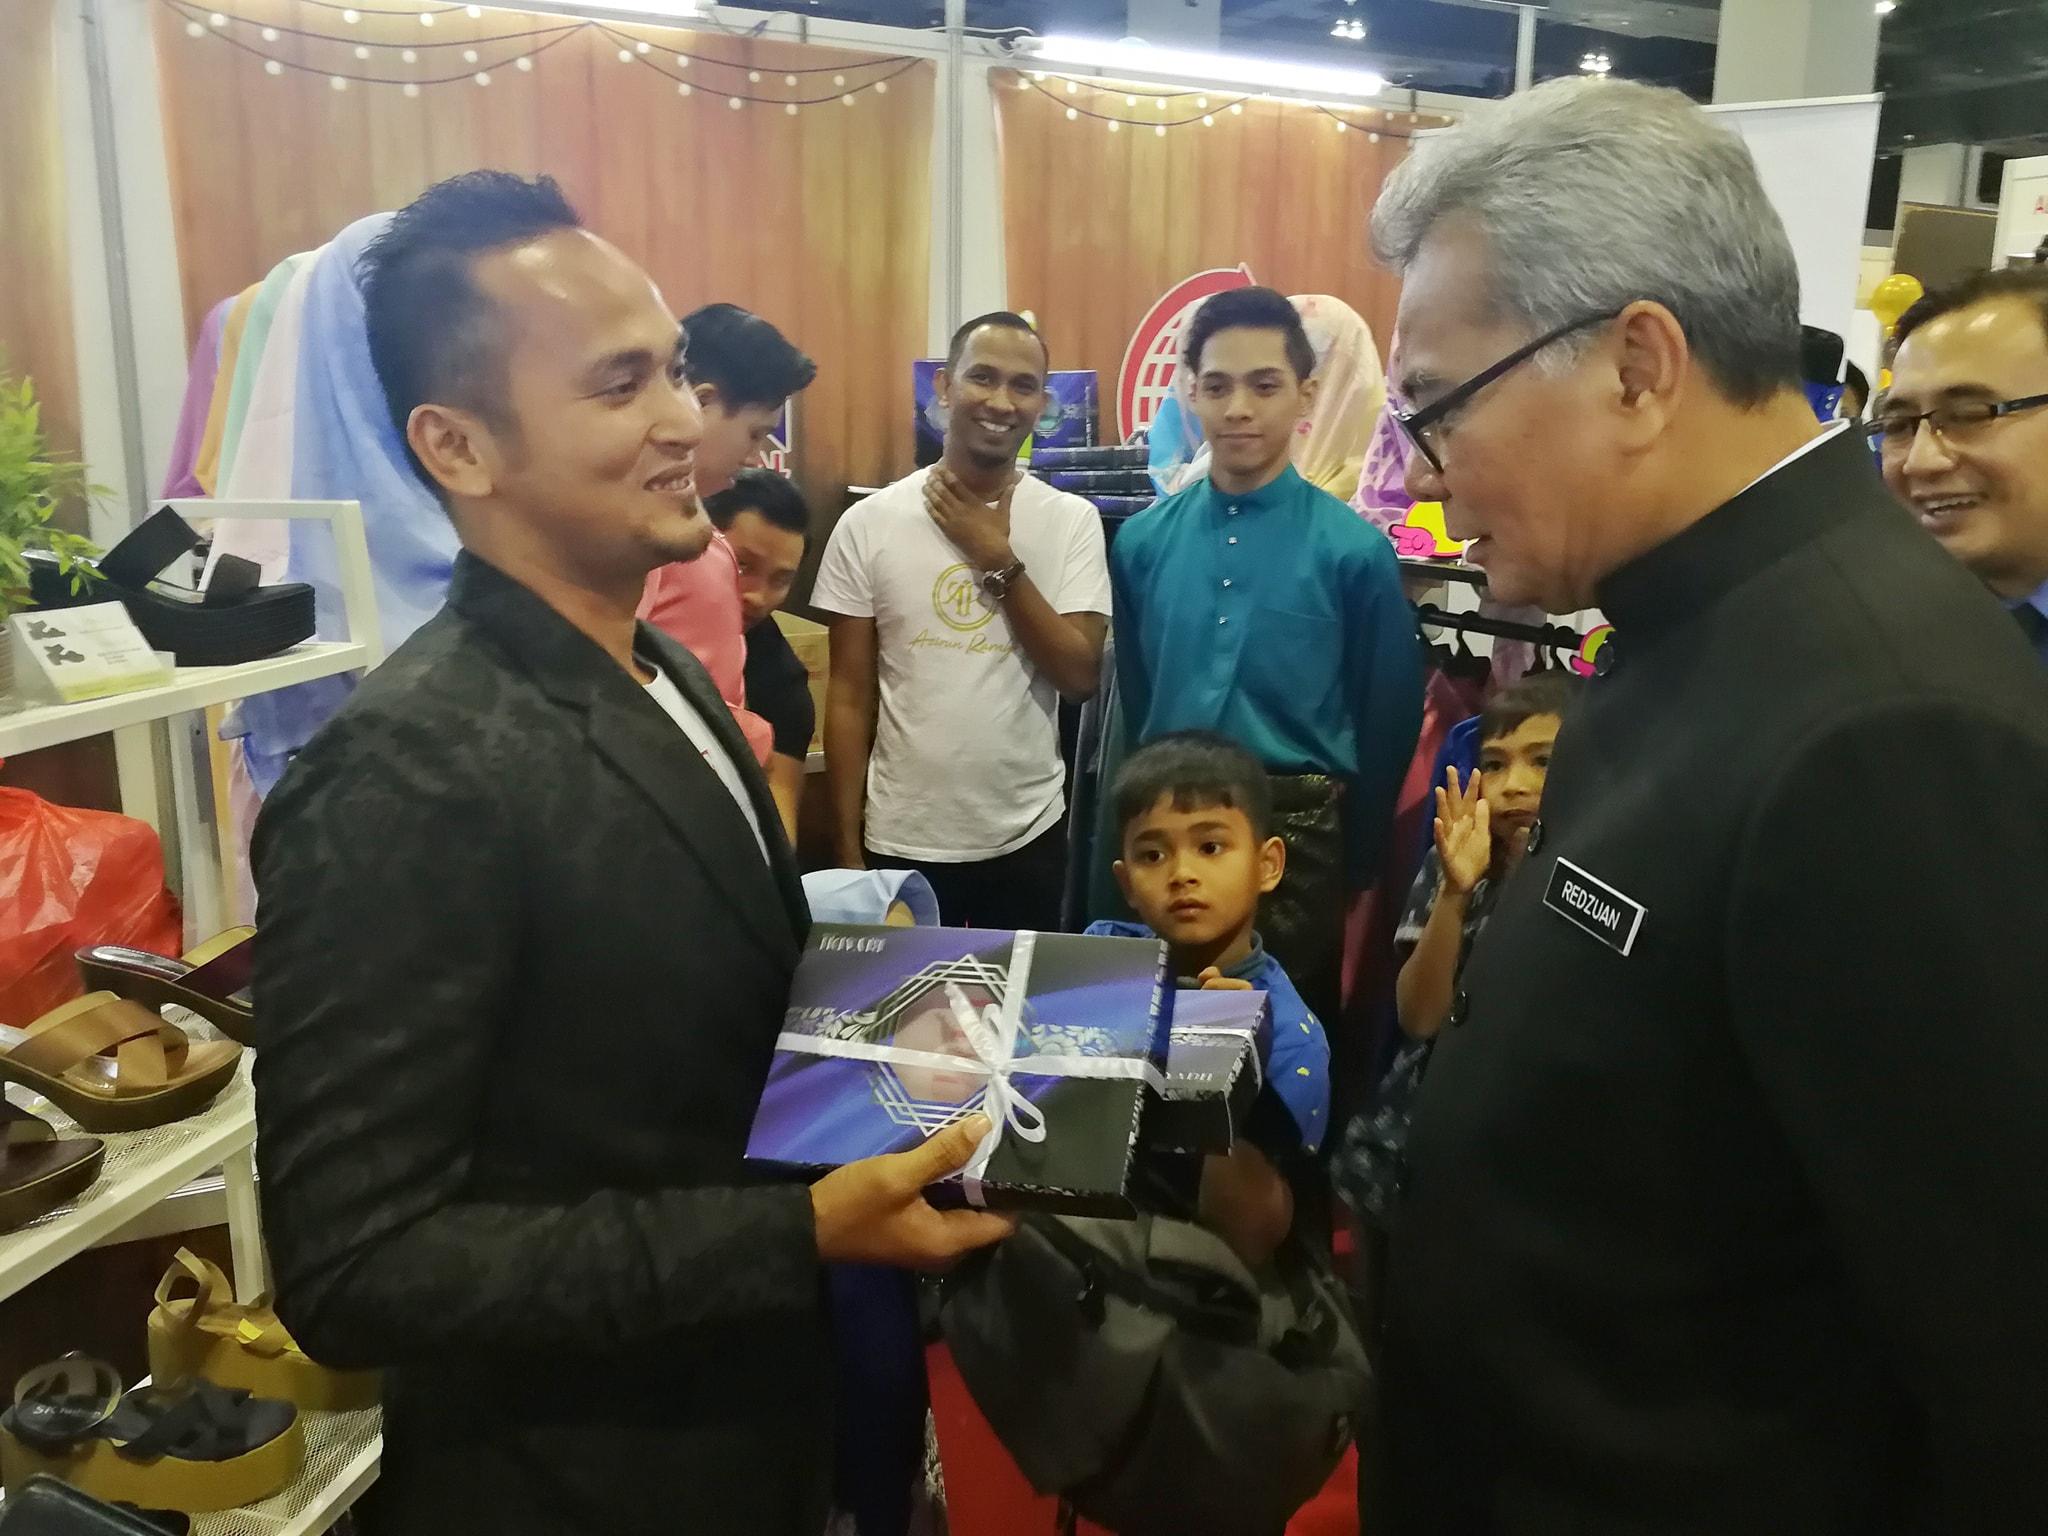 Booth TEKUN @ Mood Republik KL Raya Fest 2019